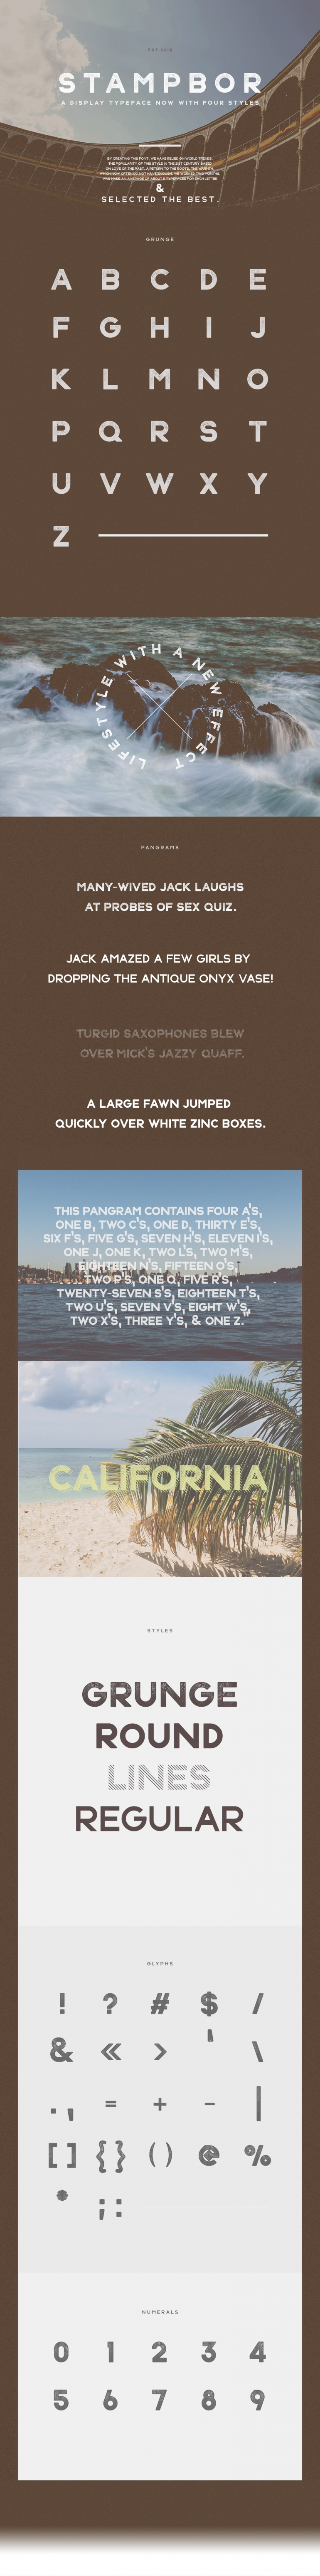 Stampbor Typeface on Behance